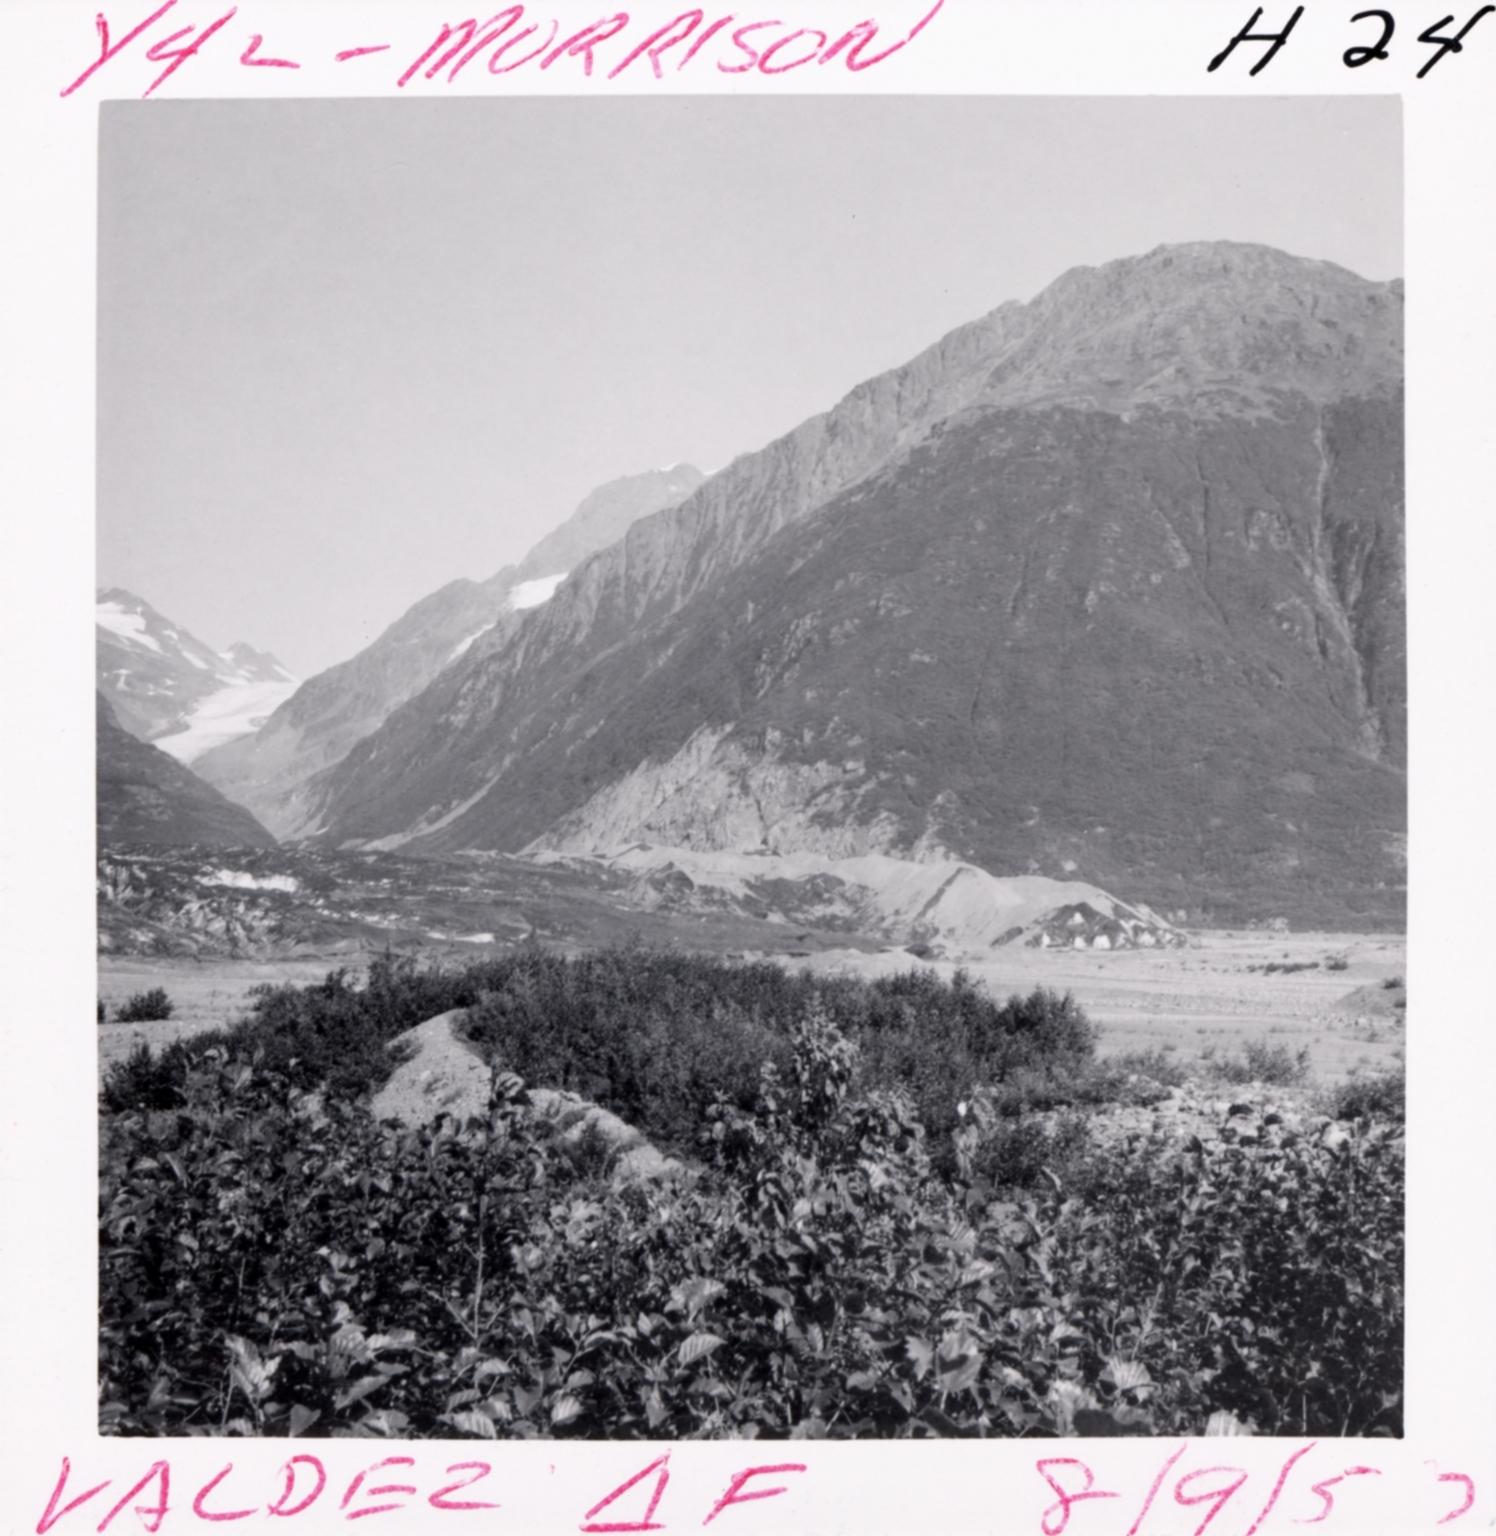 Valdez Glacier, Alaska, United States